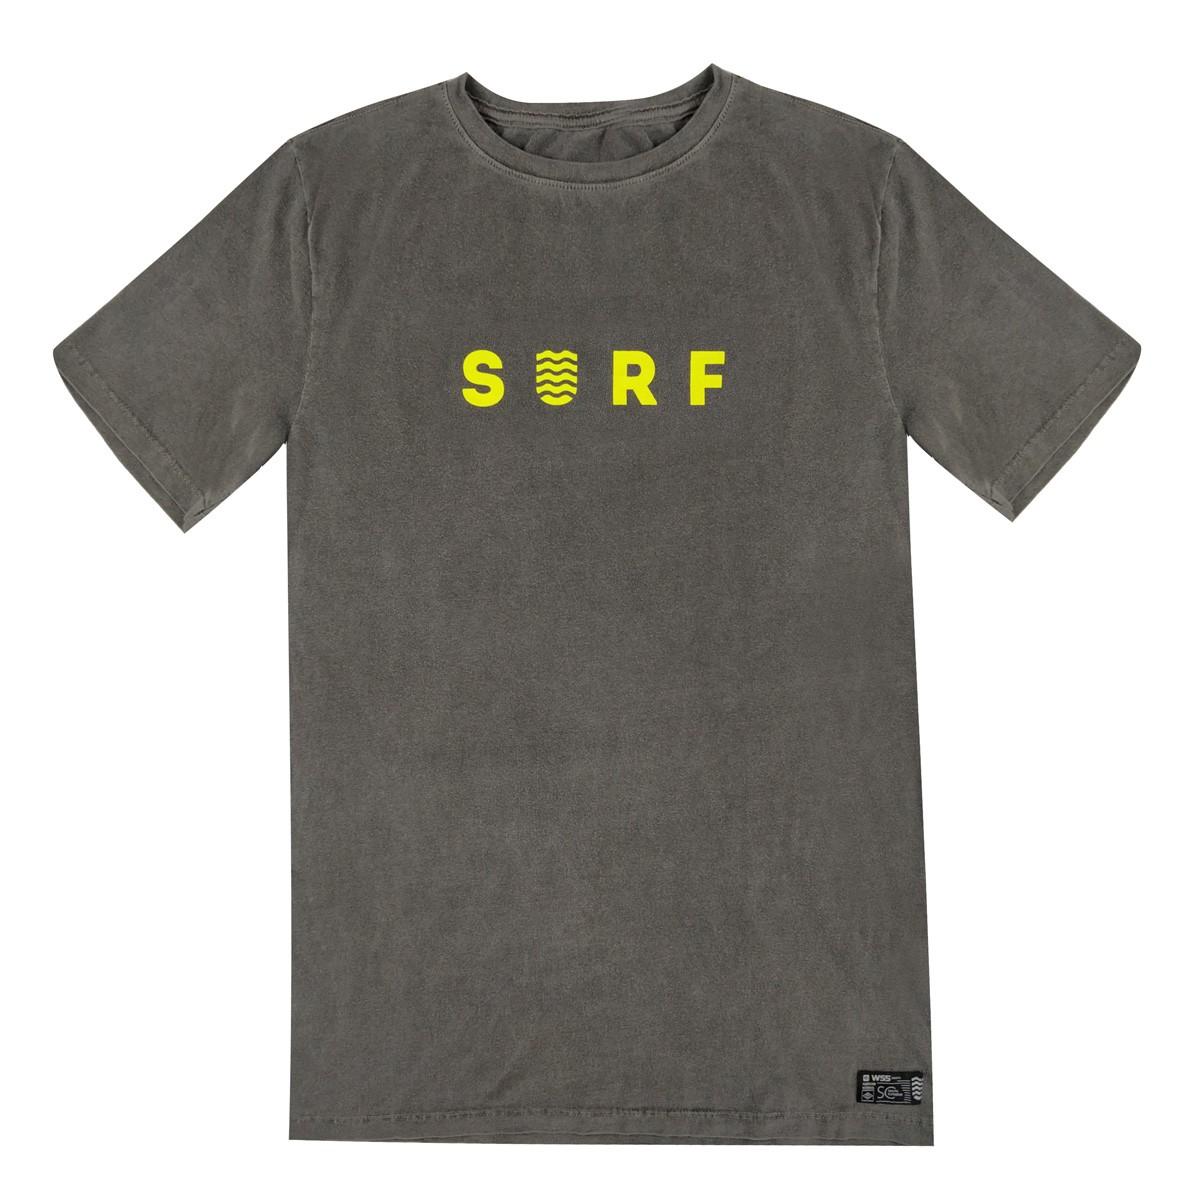 Camiseta Plus Size WSS Estonada Cinza Surf Neon Yellow Masculino